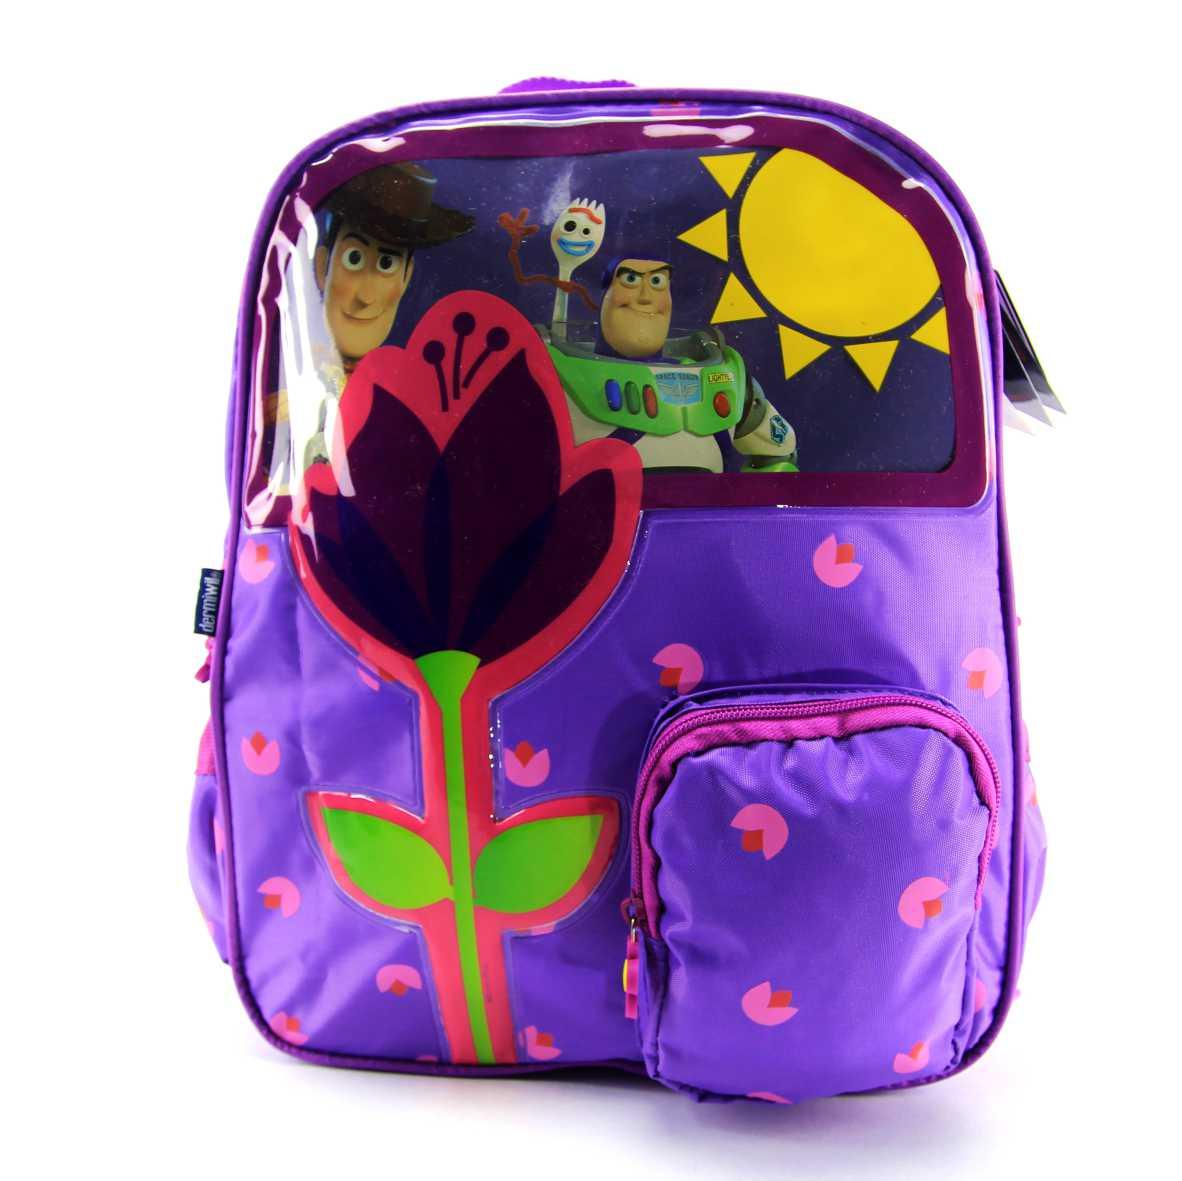 Mochila Toy Story 4 Bonnie Costas Infantil Dermiwil Disney 37562